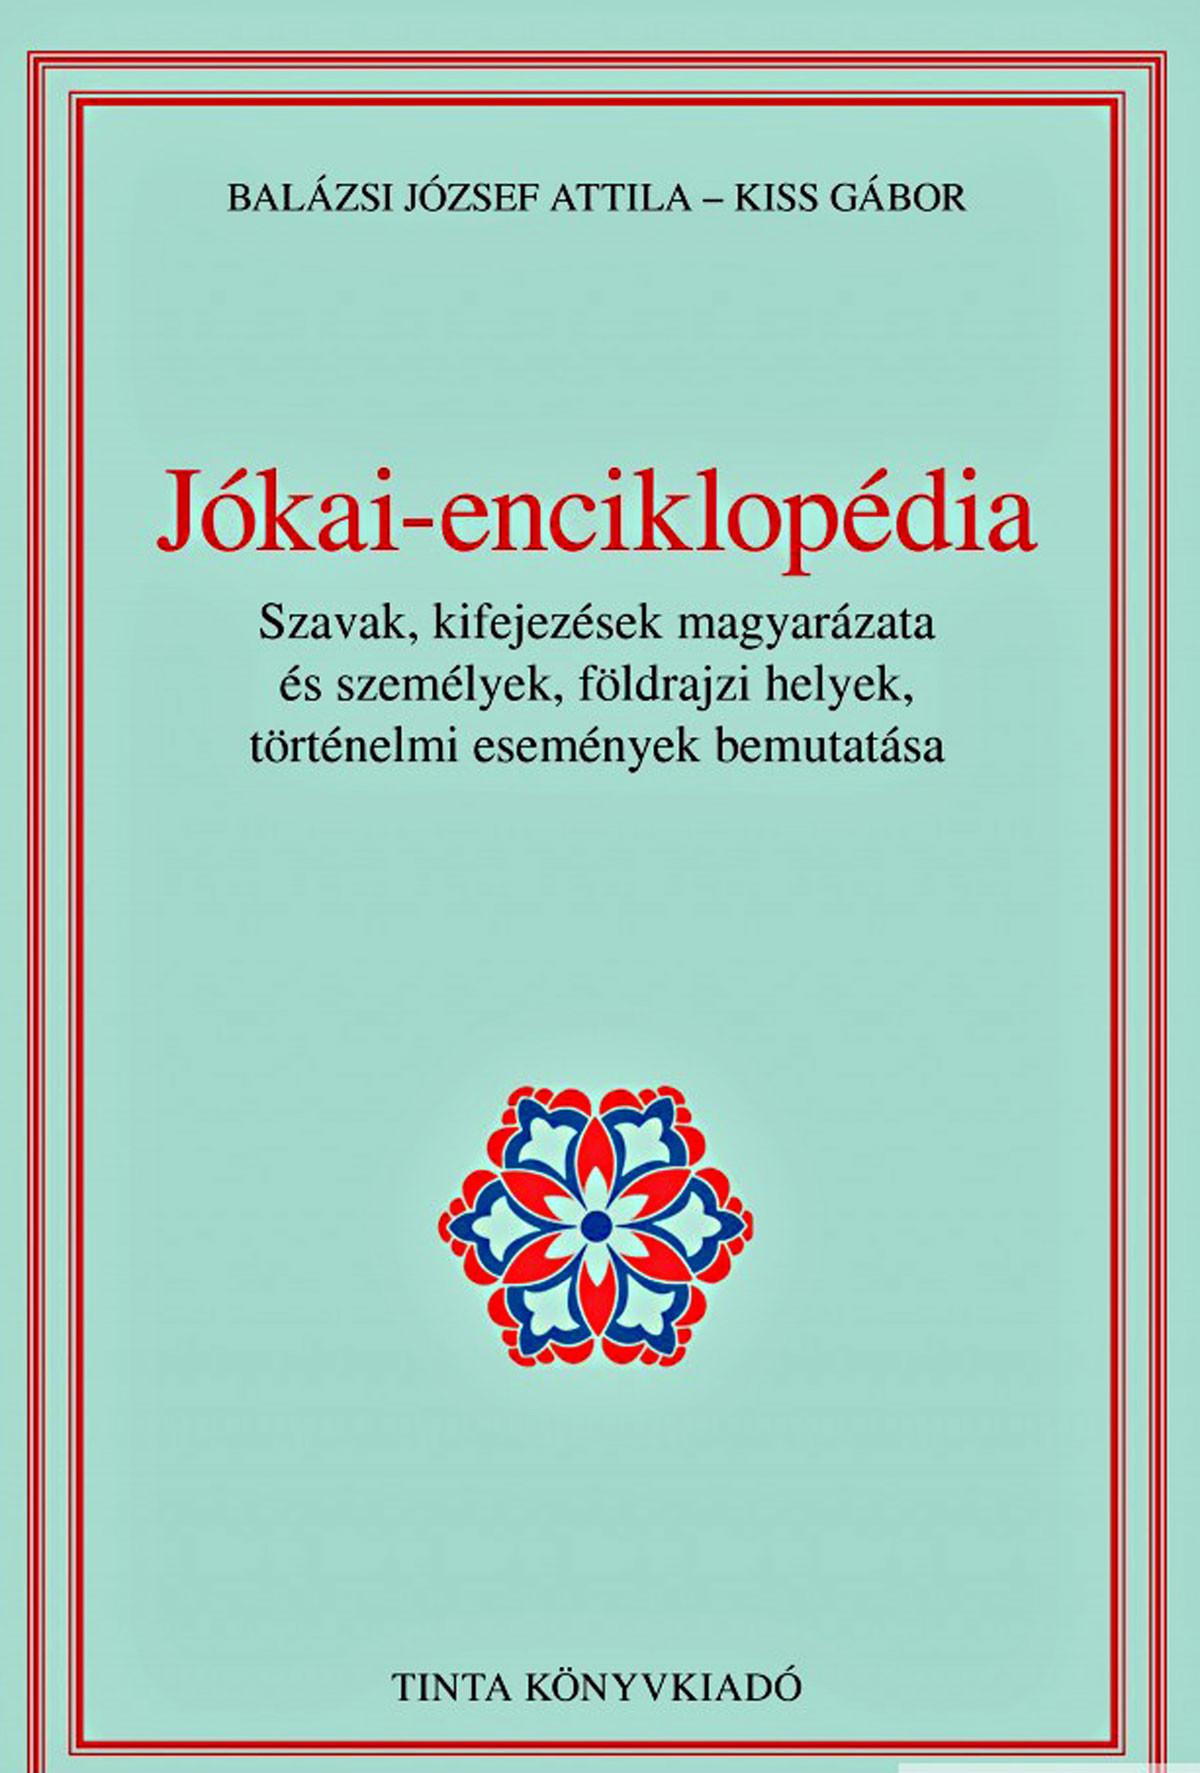 Jókai-enciklopédia